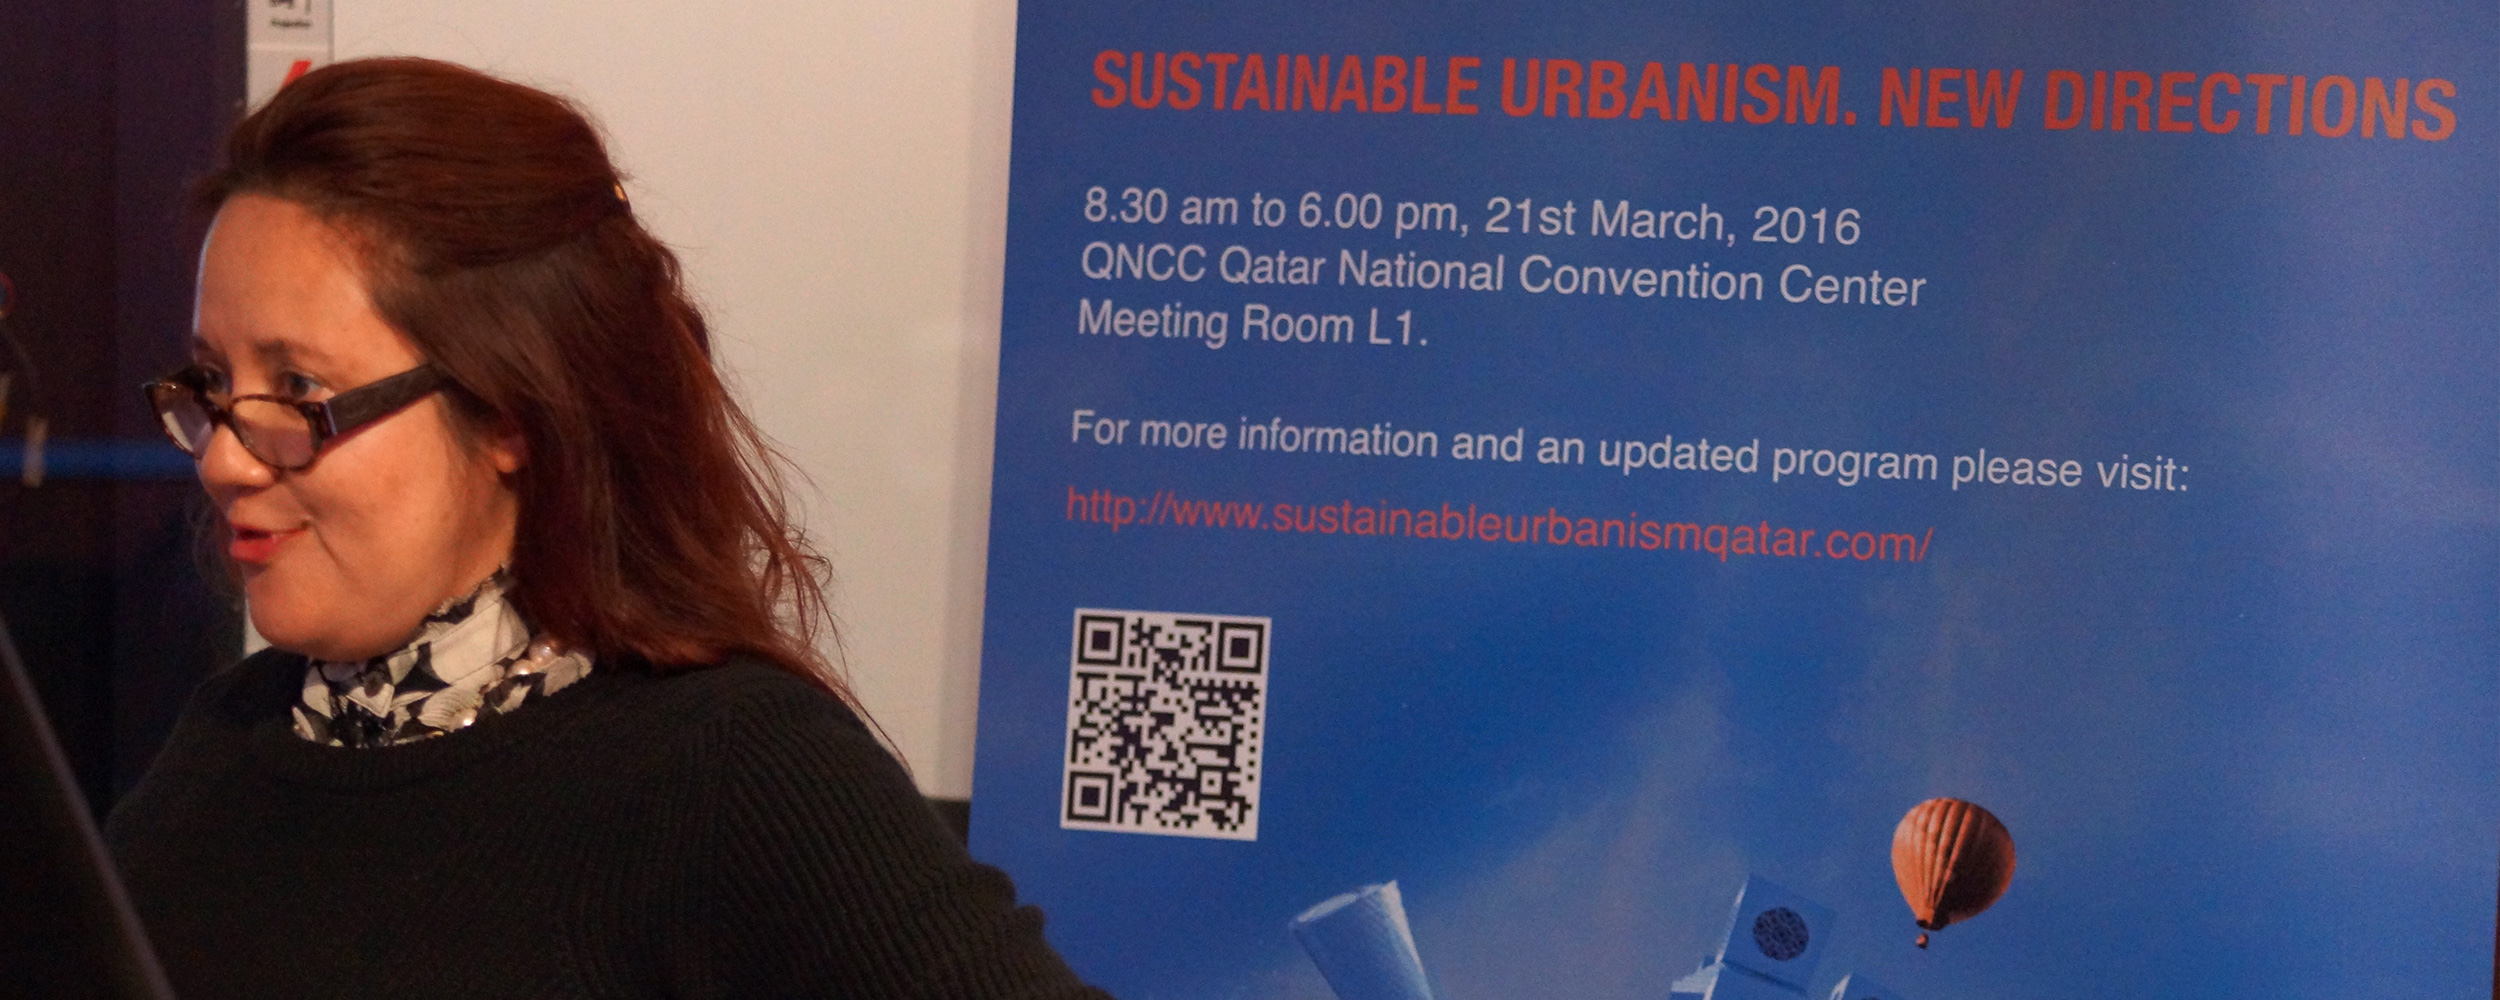 Sharifah Hamza presenting at the Sustainable Urbanism: New Directions Workshop, 21 March 2016, Qatar University, © Qatar University.